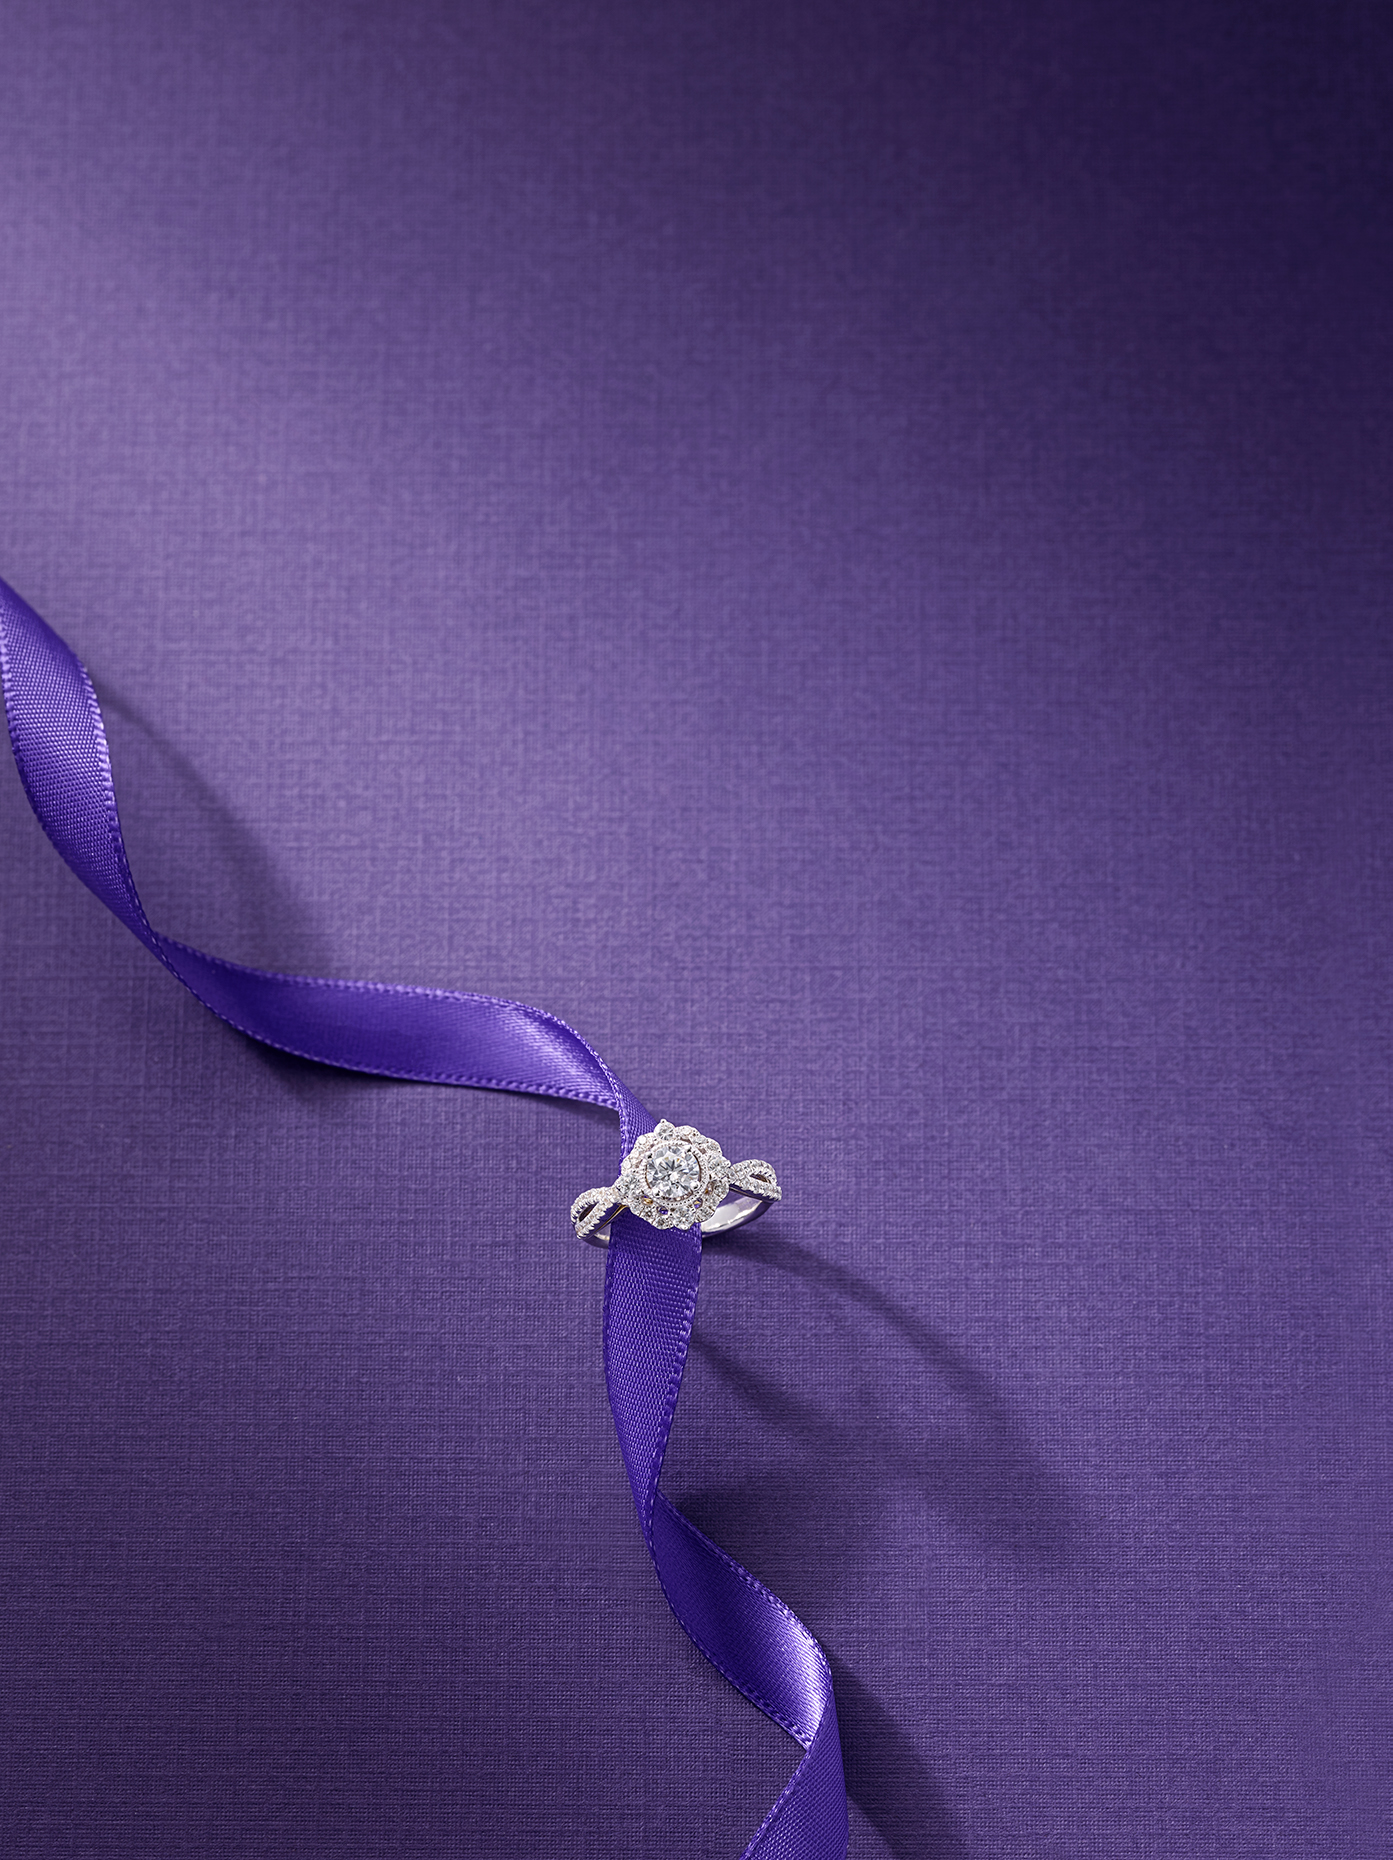 Product_photography_Jewelry_Derek_Israelsen_ZacPosen003_Diamond_.jpg